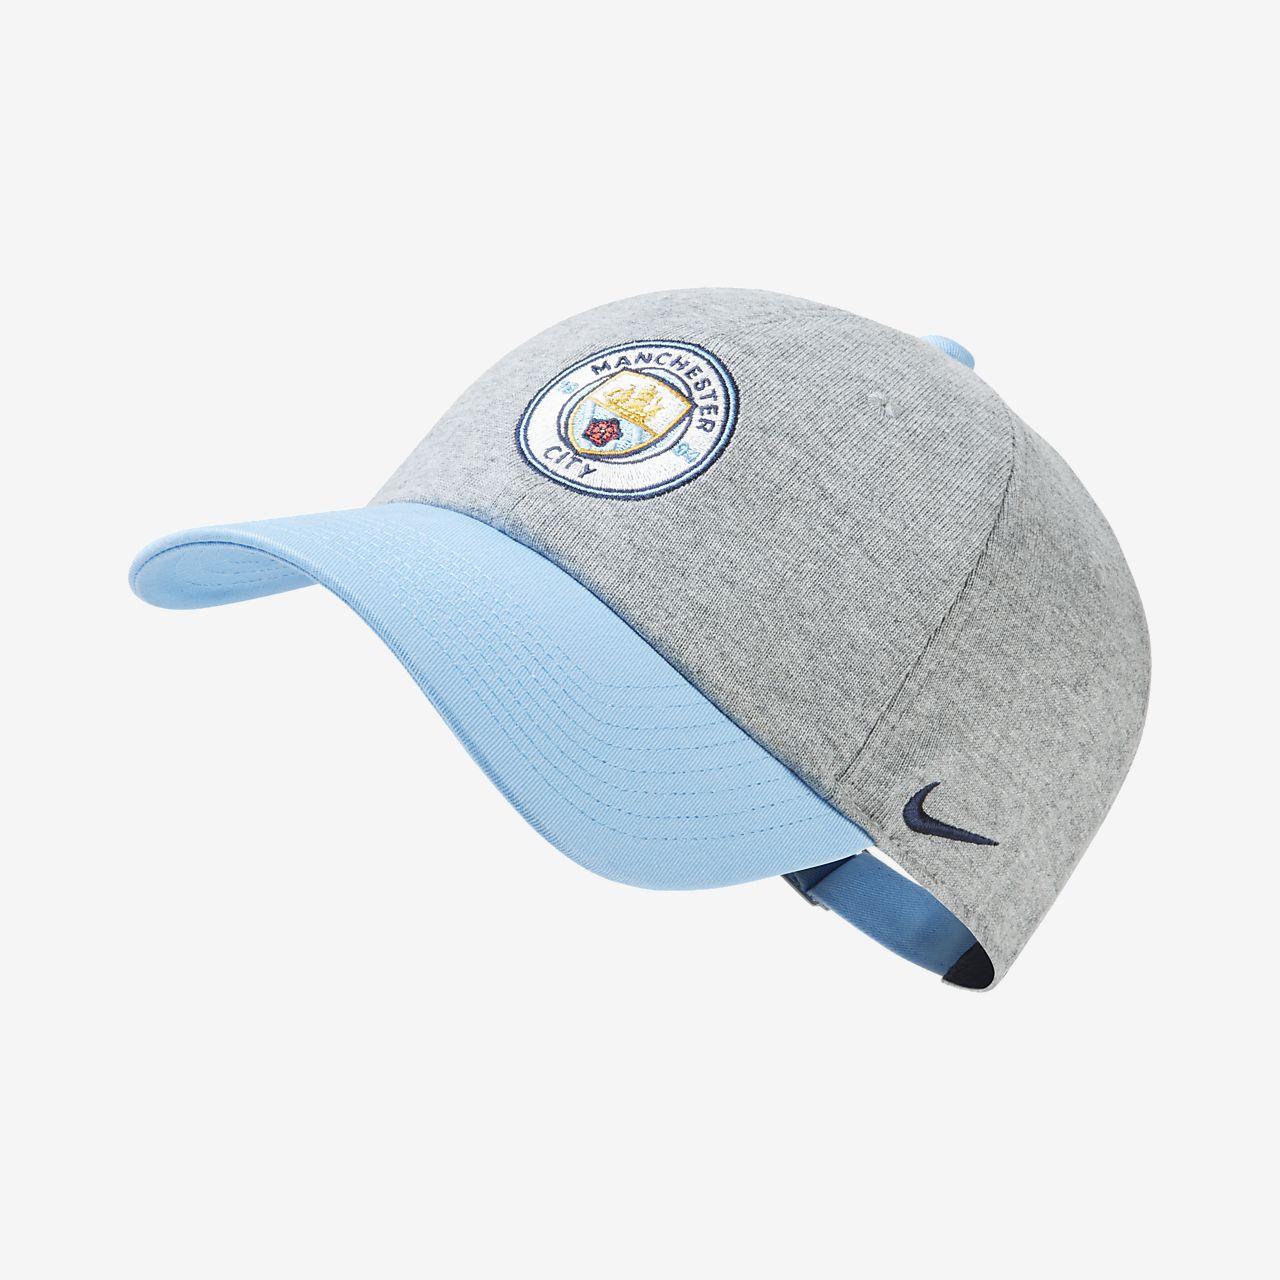 e7dc263c161 Manchester City FC Heritage 86 Adjustable Hat. Nike.com CA